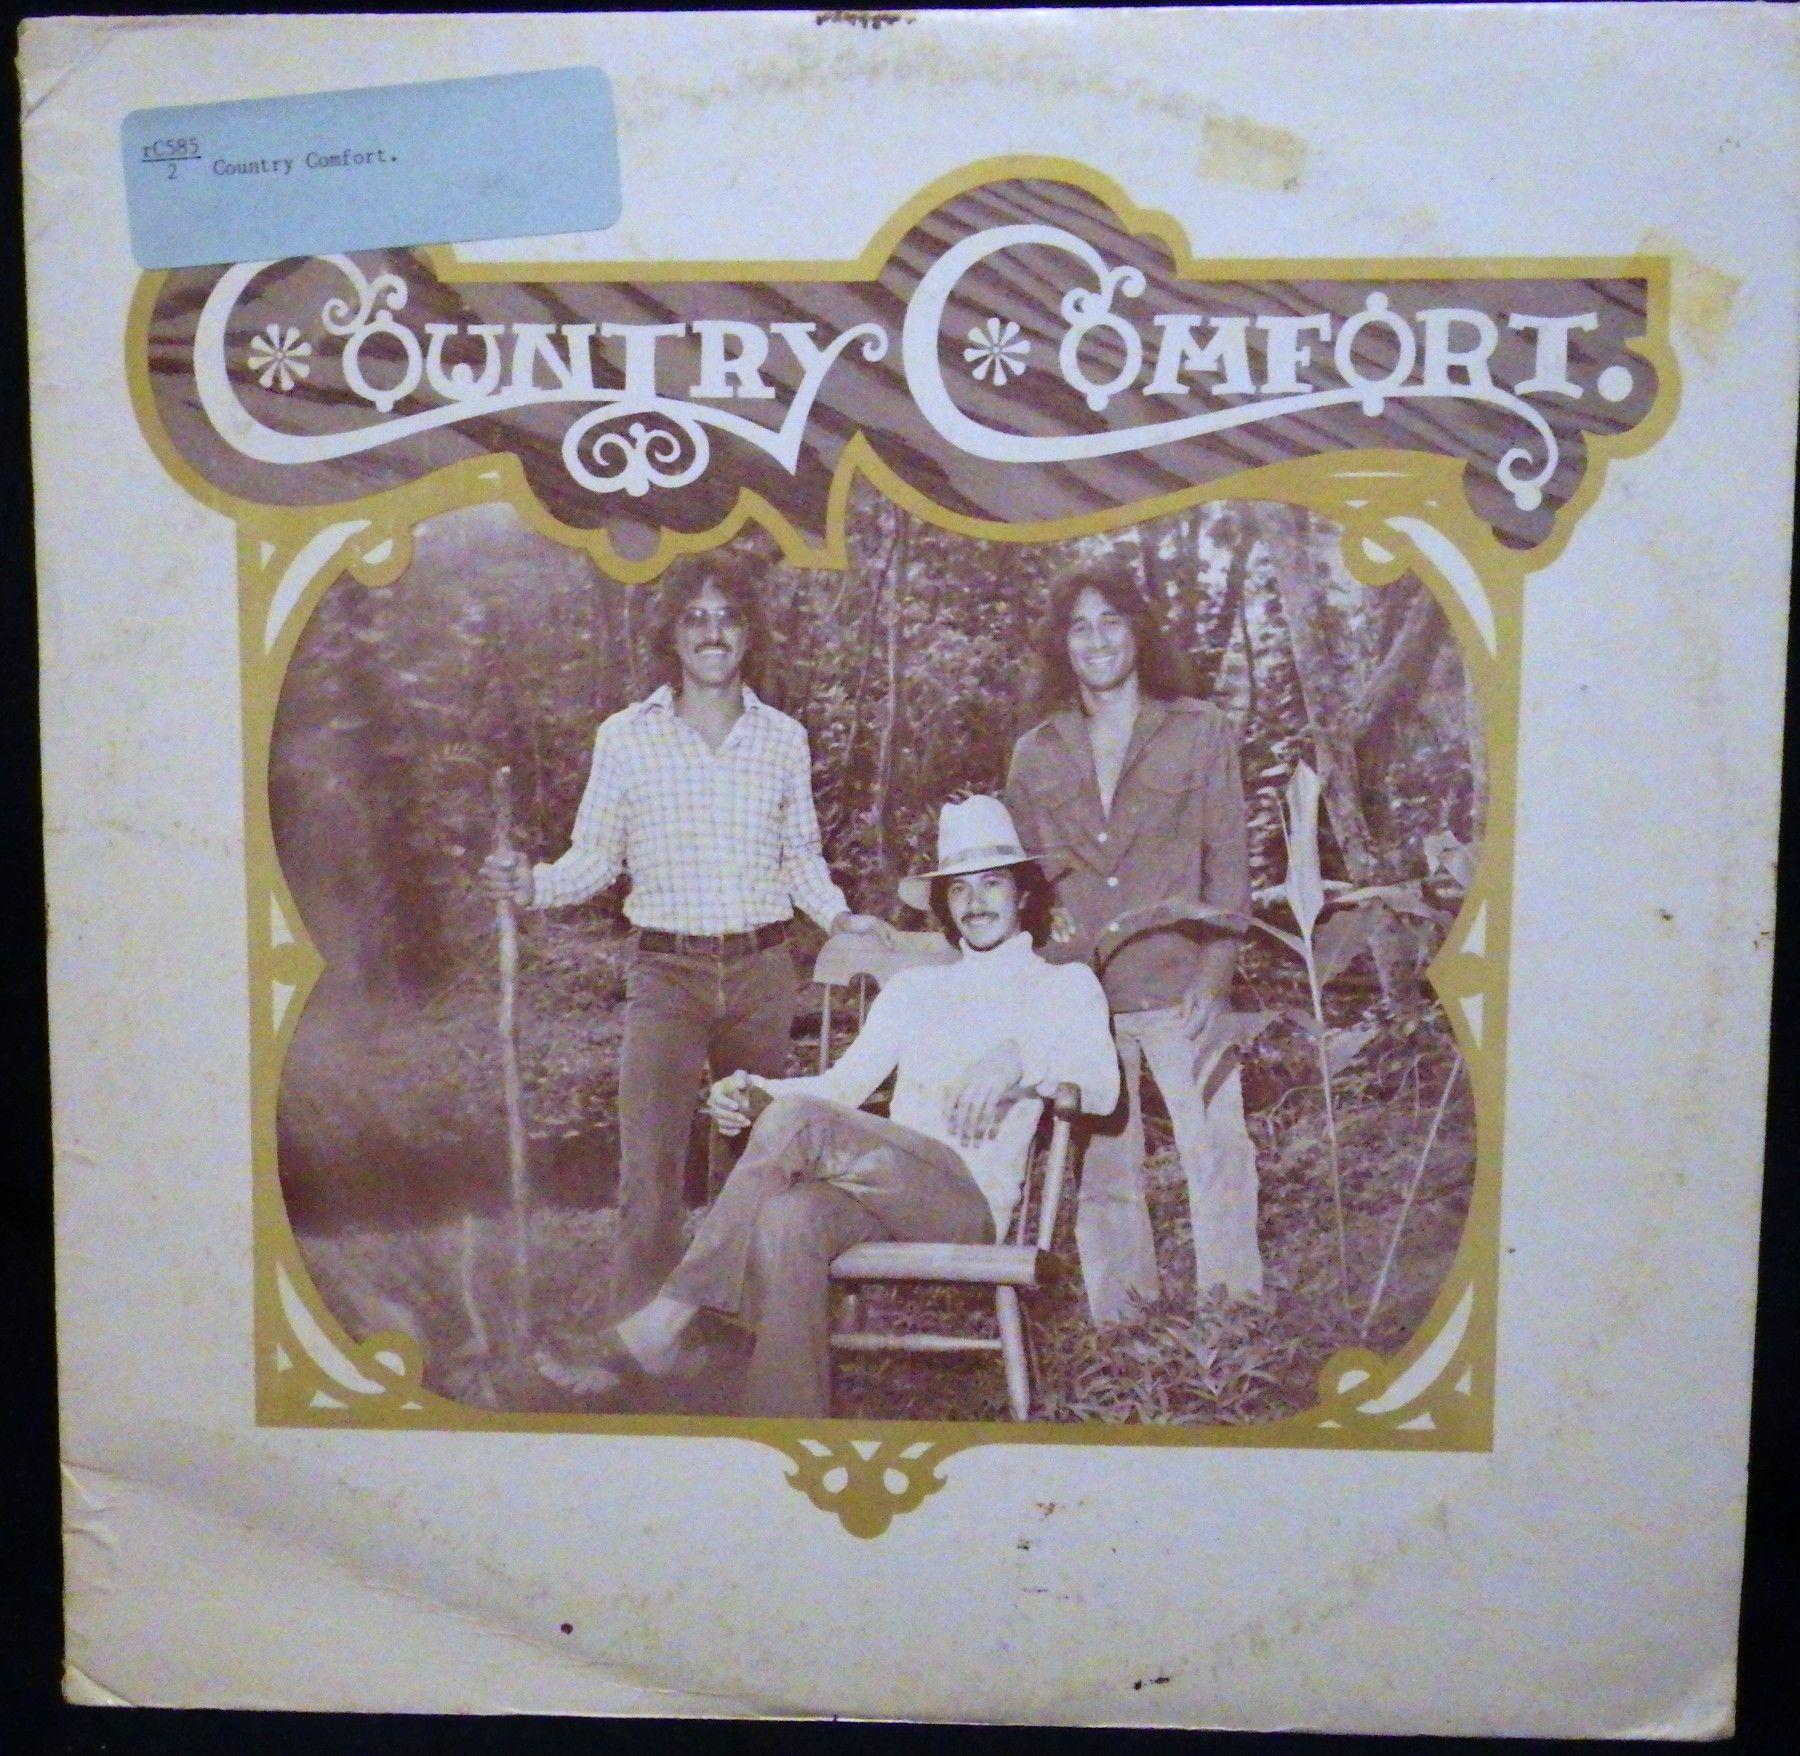 Country comfort honolulu hawaii trim tlp1984 stereo